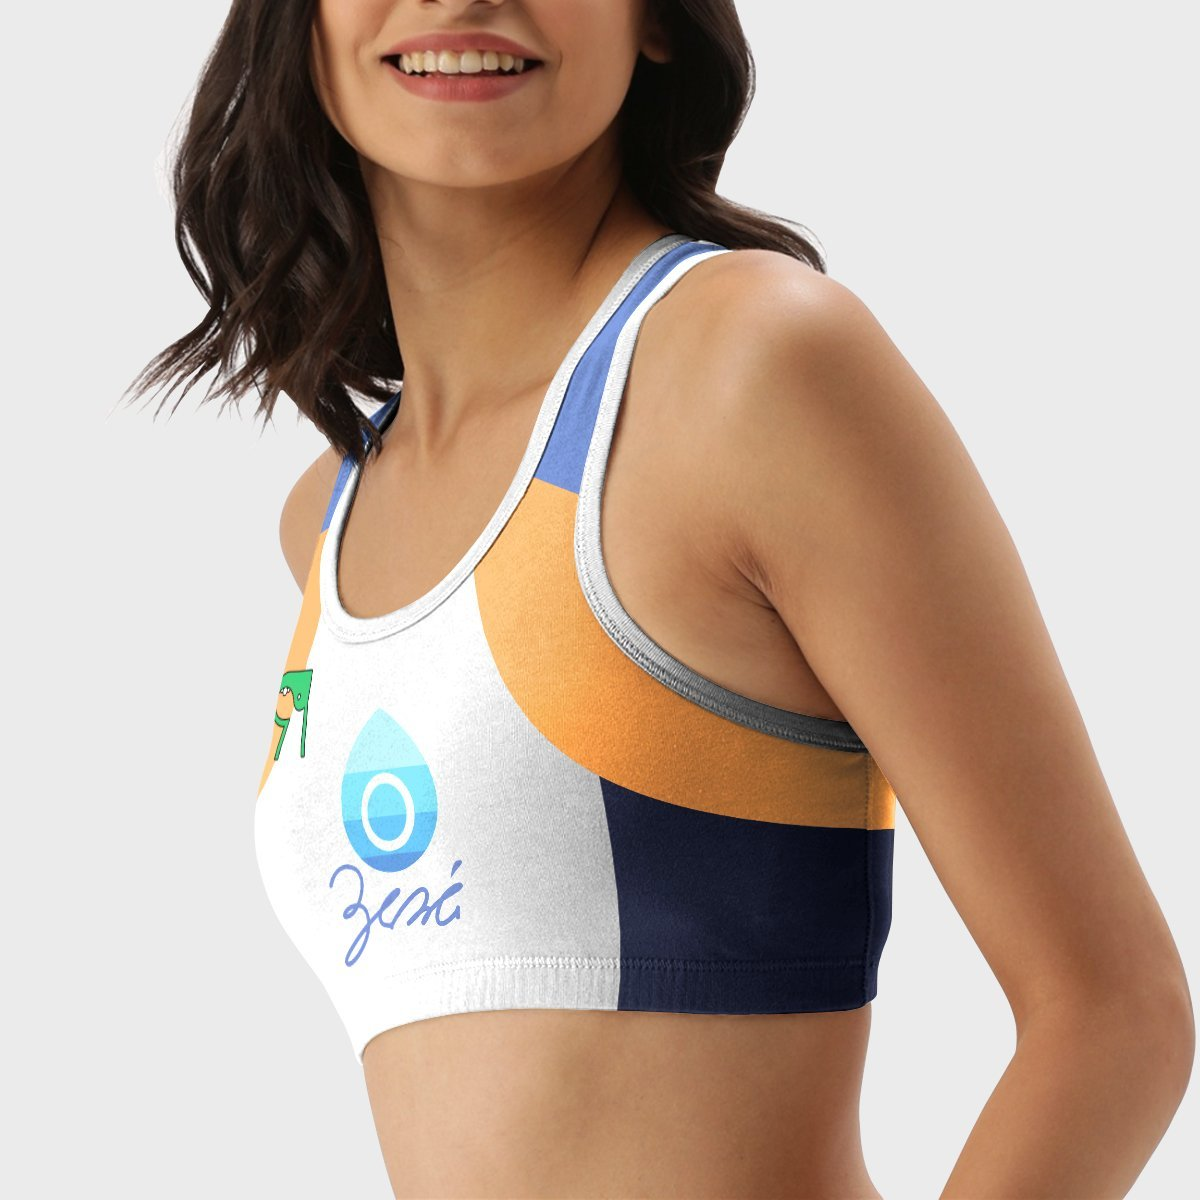 pokemon water uniform active wear set 572316 - Anime Swimsuits